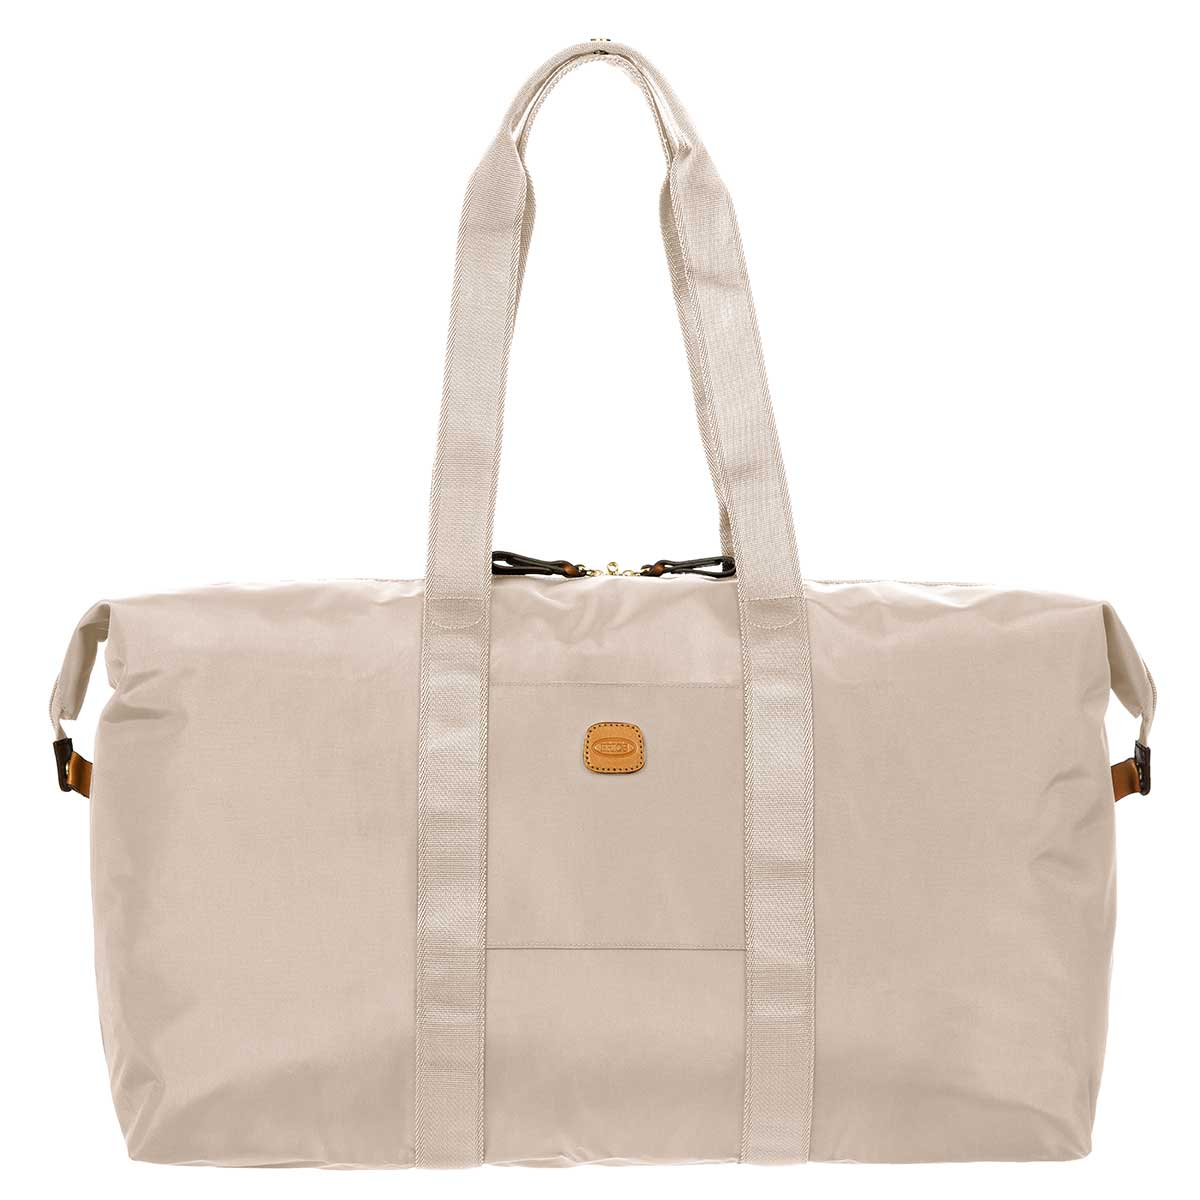 X-Bag 18″ Folding Duffle Bag - Papyrus | BRIC'S Travel Bag